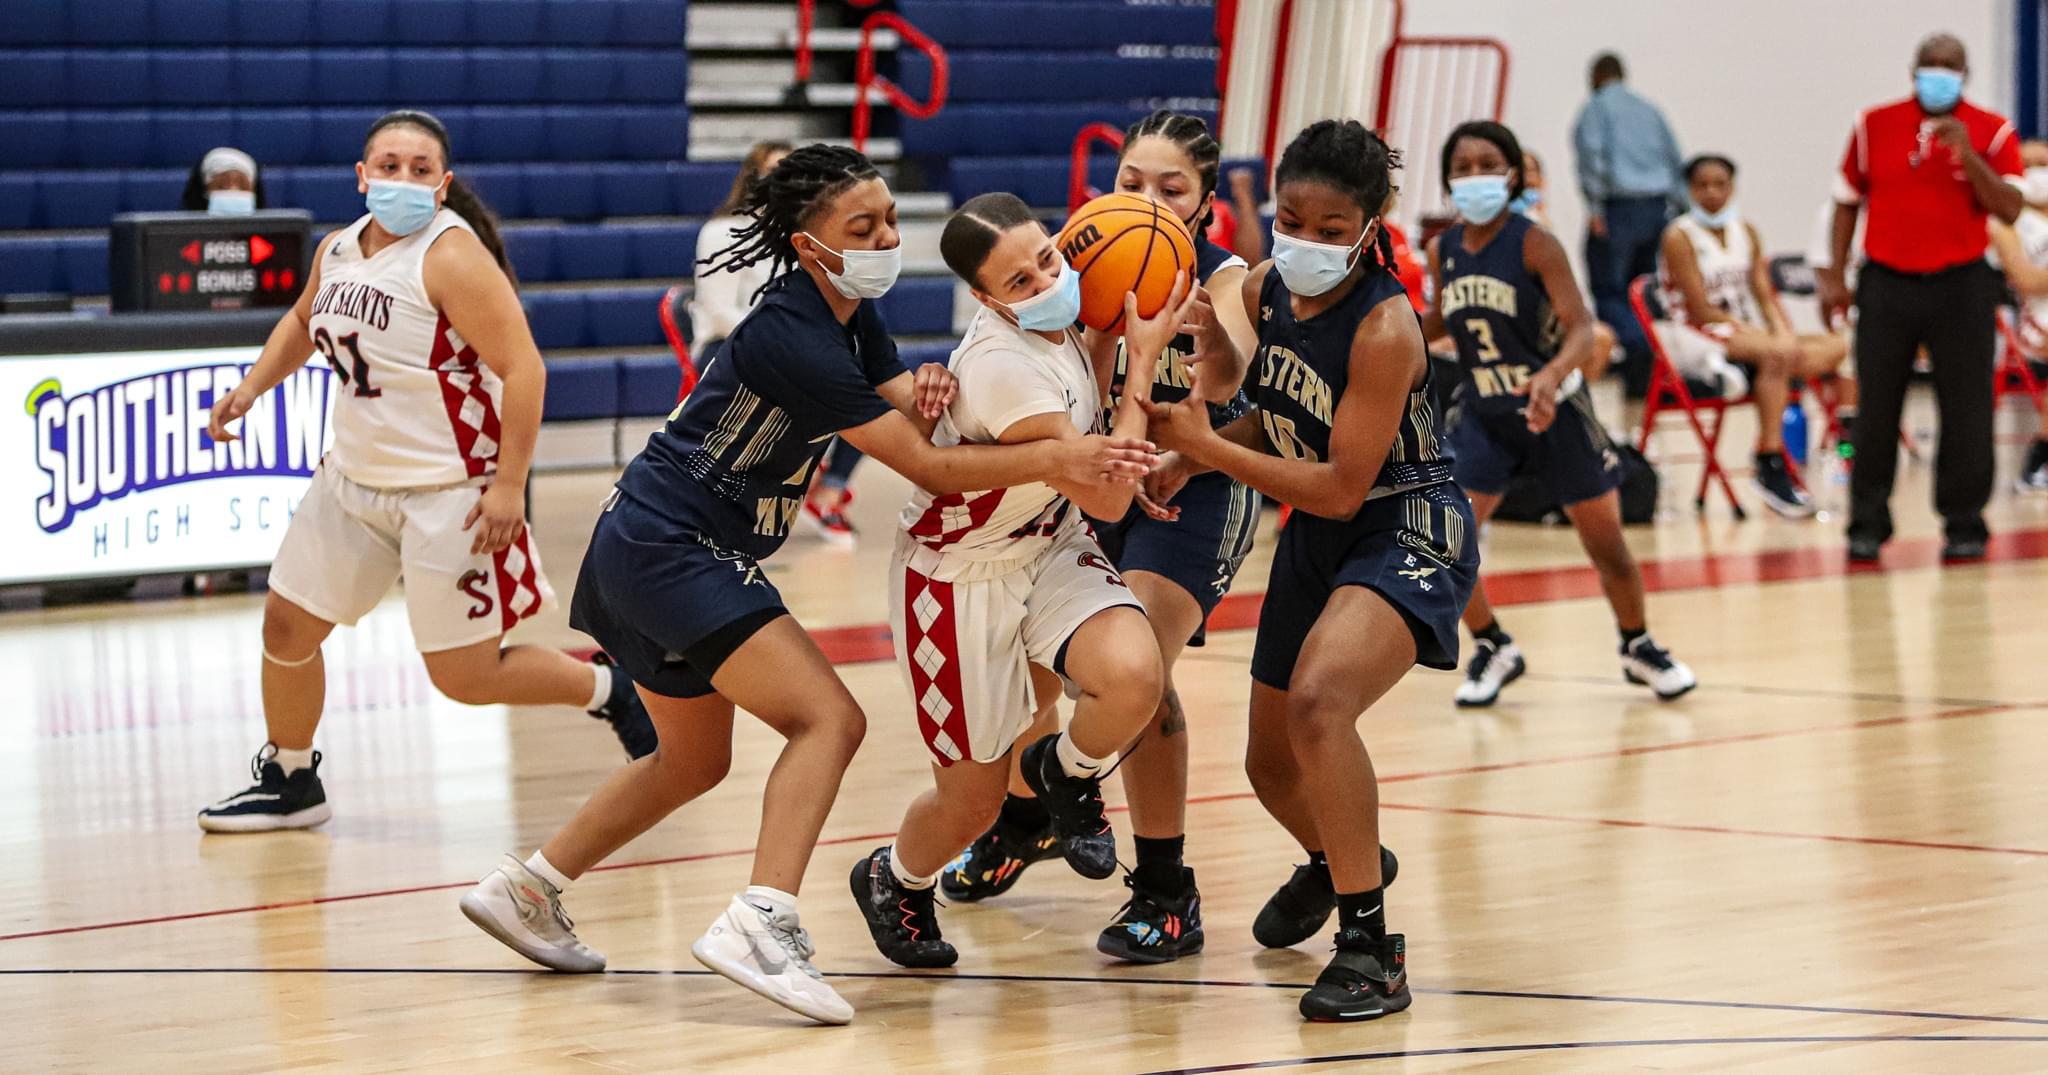 Girls Basketball: Southern Wayne Prevails On Senior Night (PHOTO GALLERY)